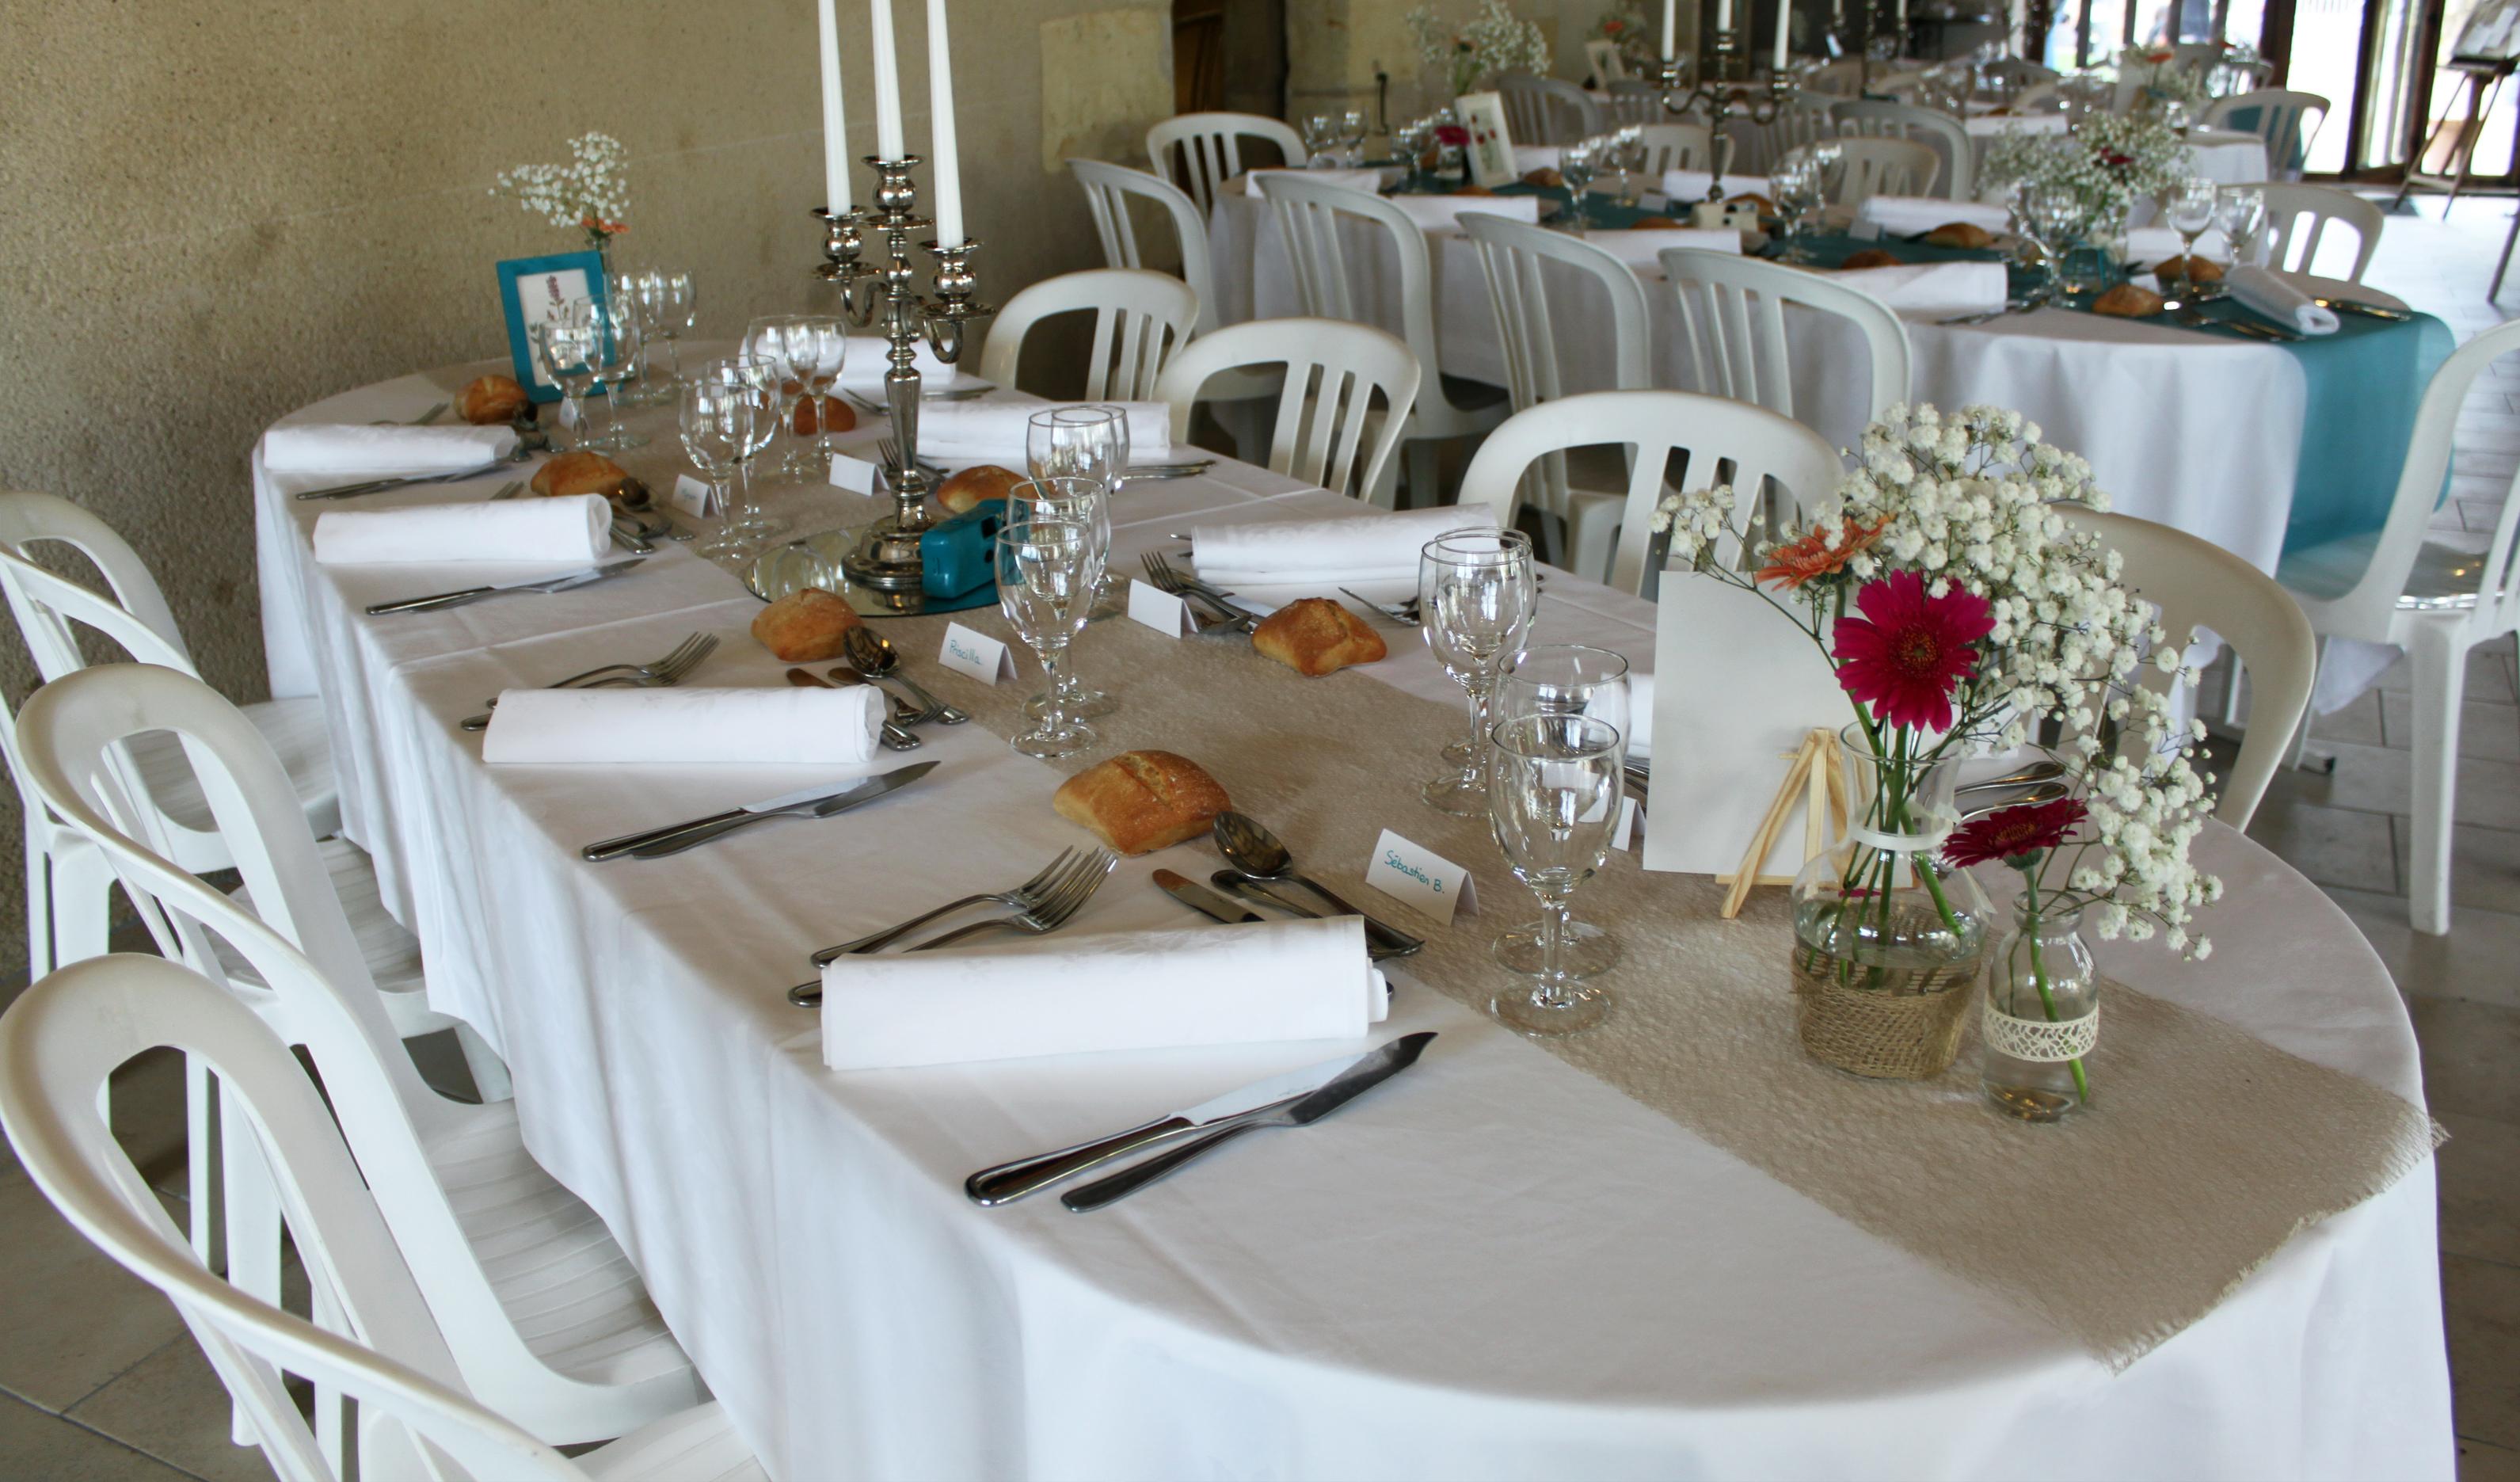 Mariage fleuri, les tables